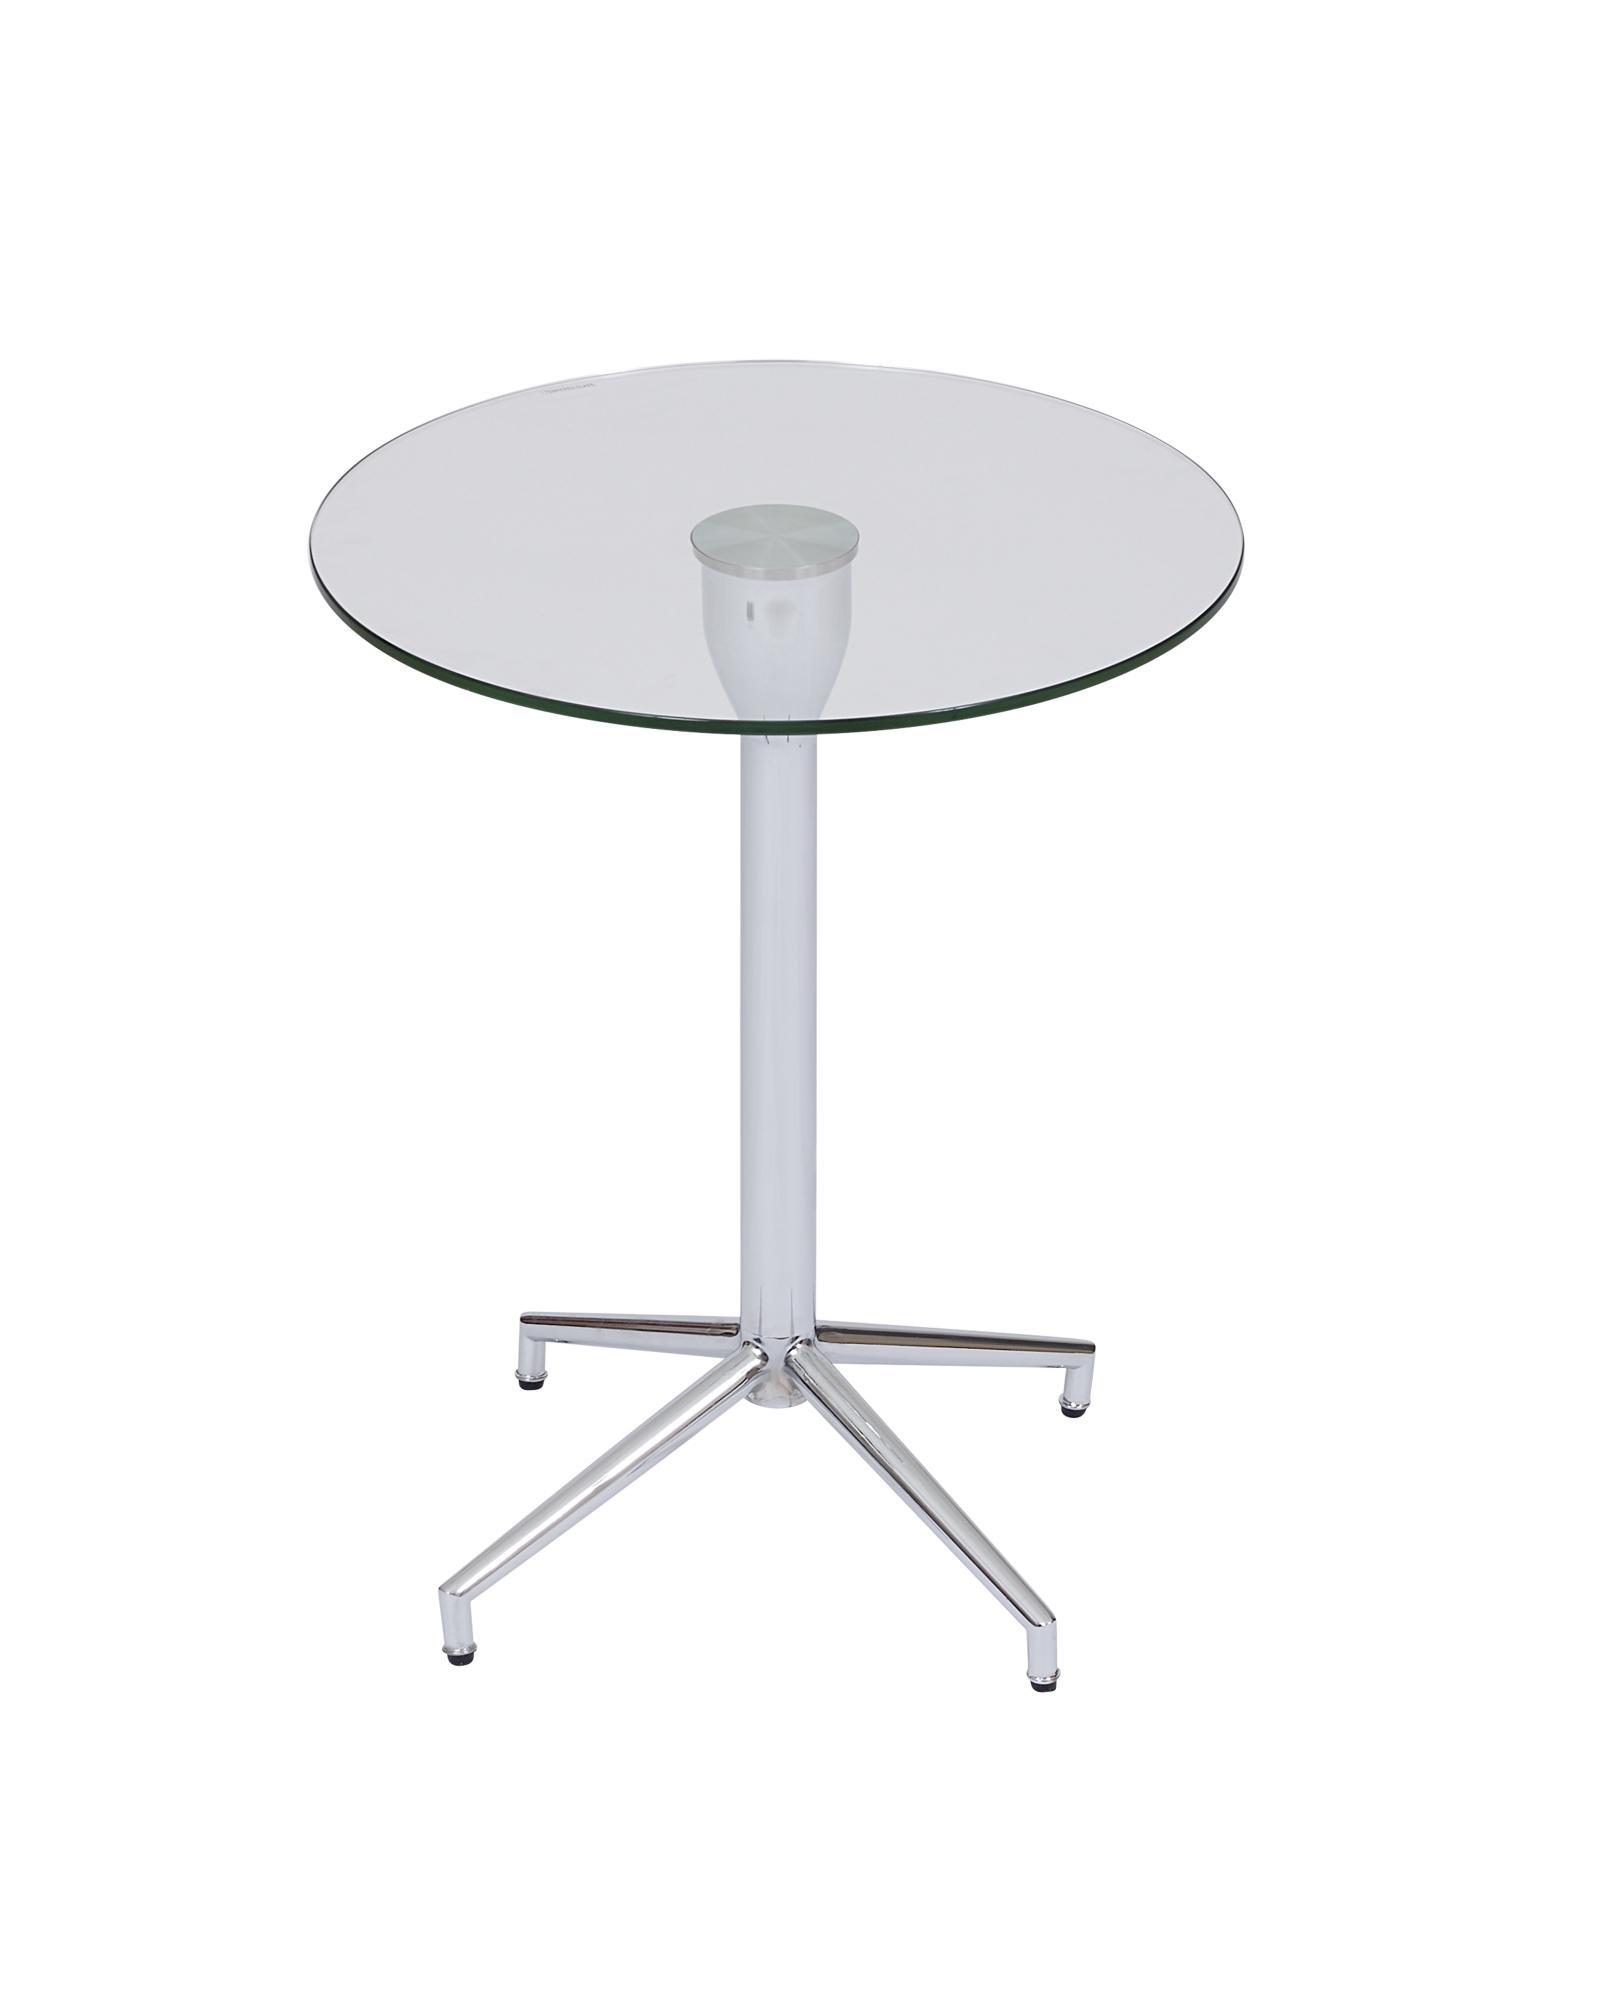 Salduba Chrome Tempered Glass Side Table